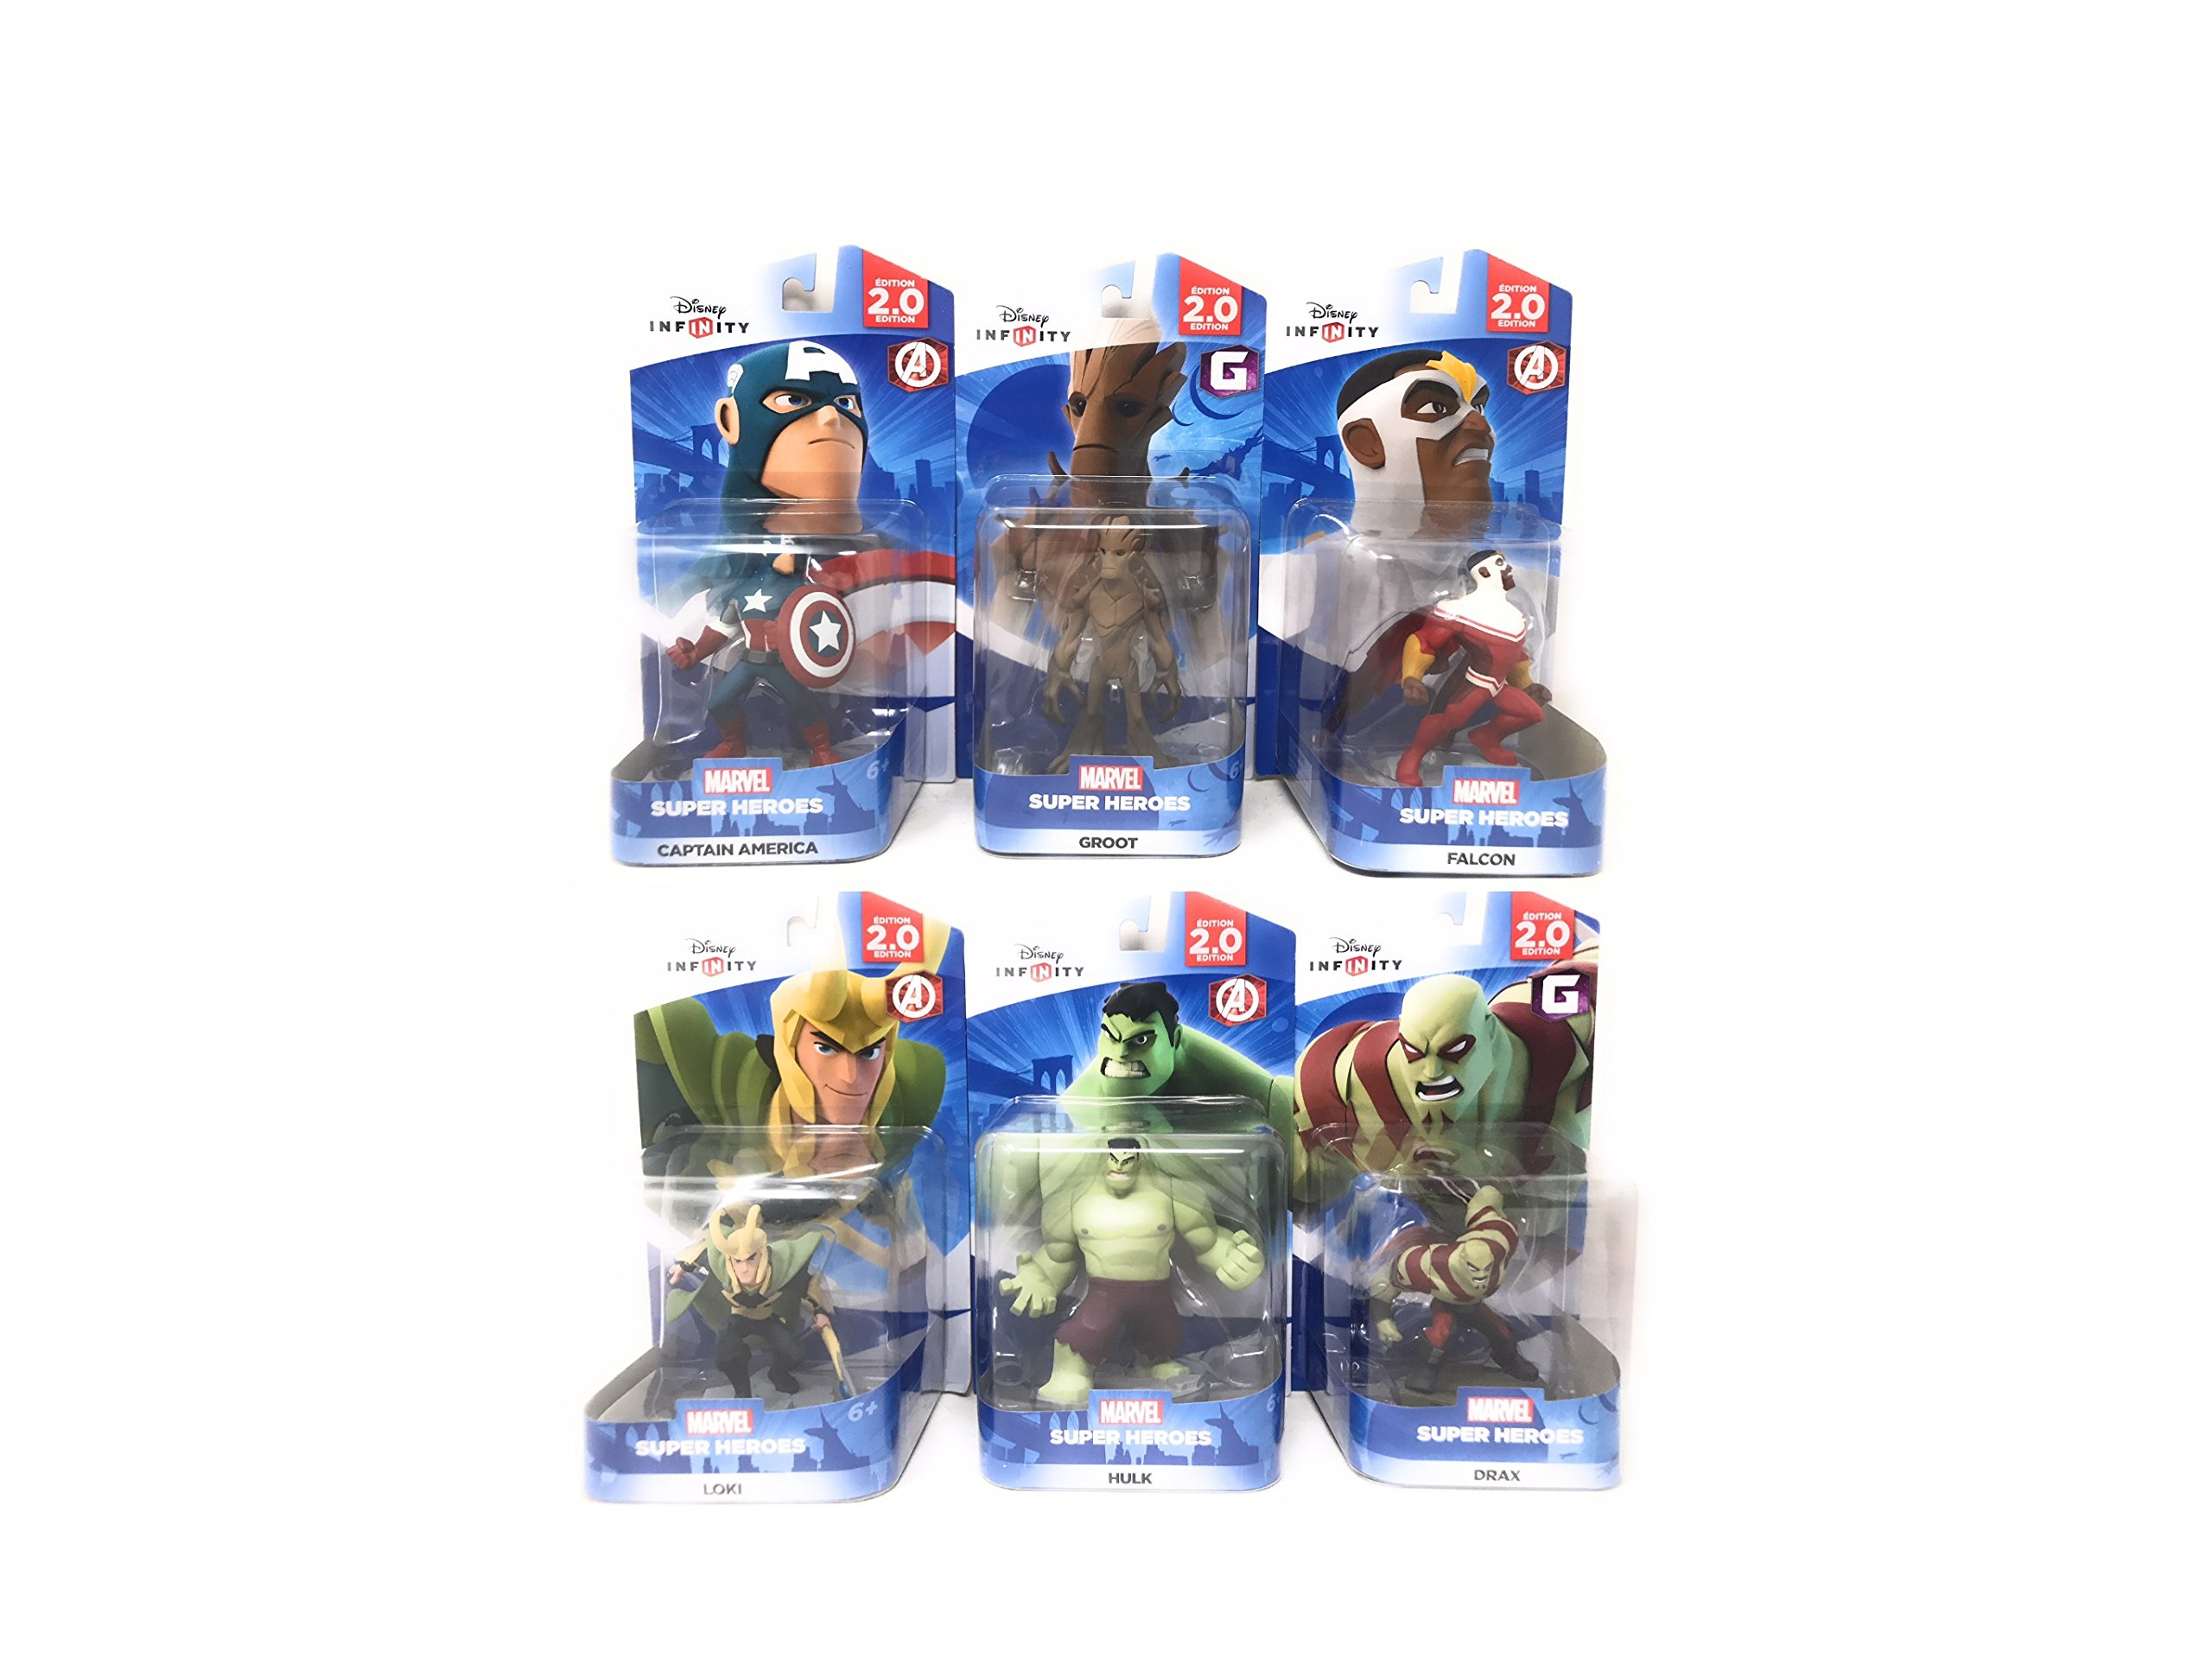 Disney Infinity: Super Heroes (2.0 Edition) Avengers Captain America, Hulk, Falcon, Loki, Groot & Drax (2.0 Series) - Not Machine Specific